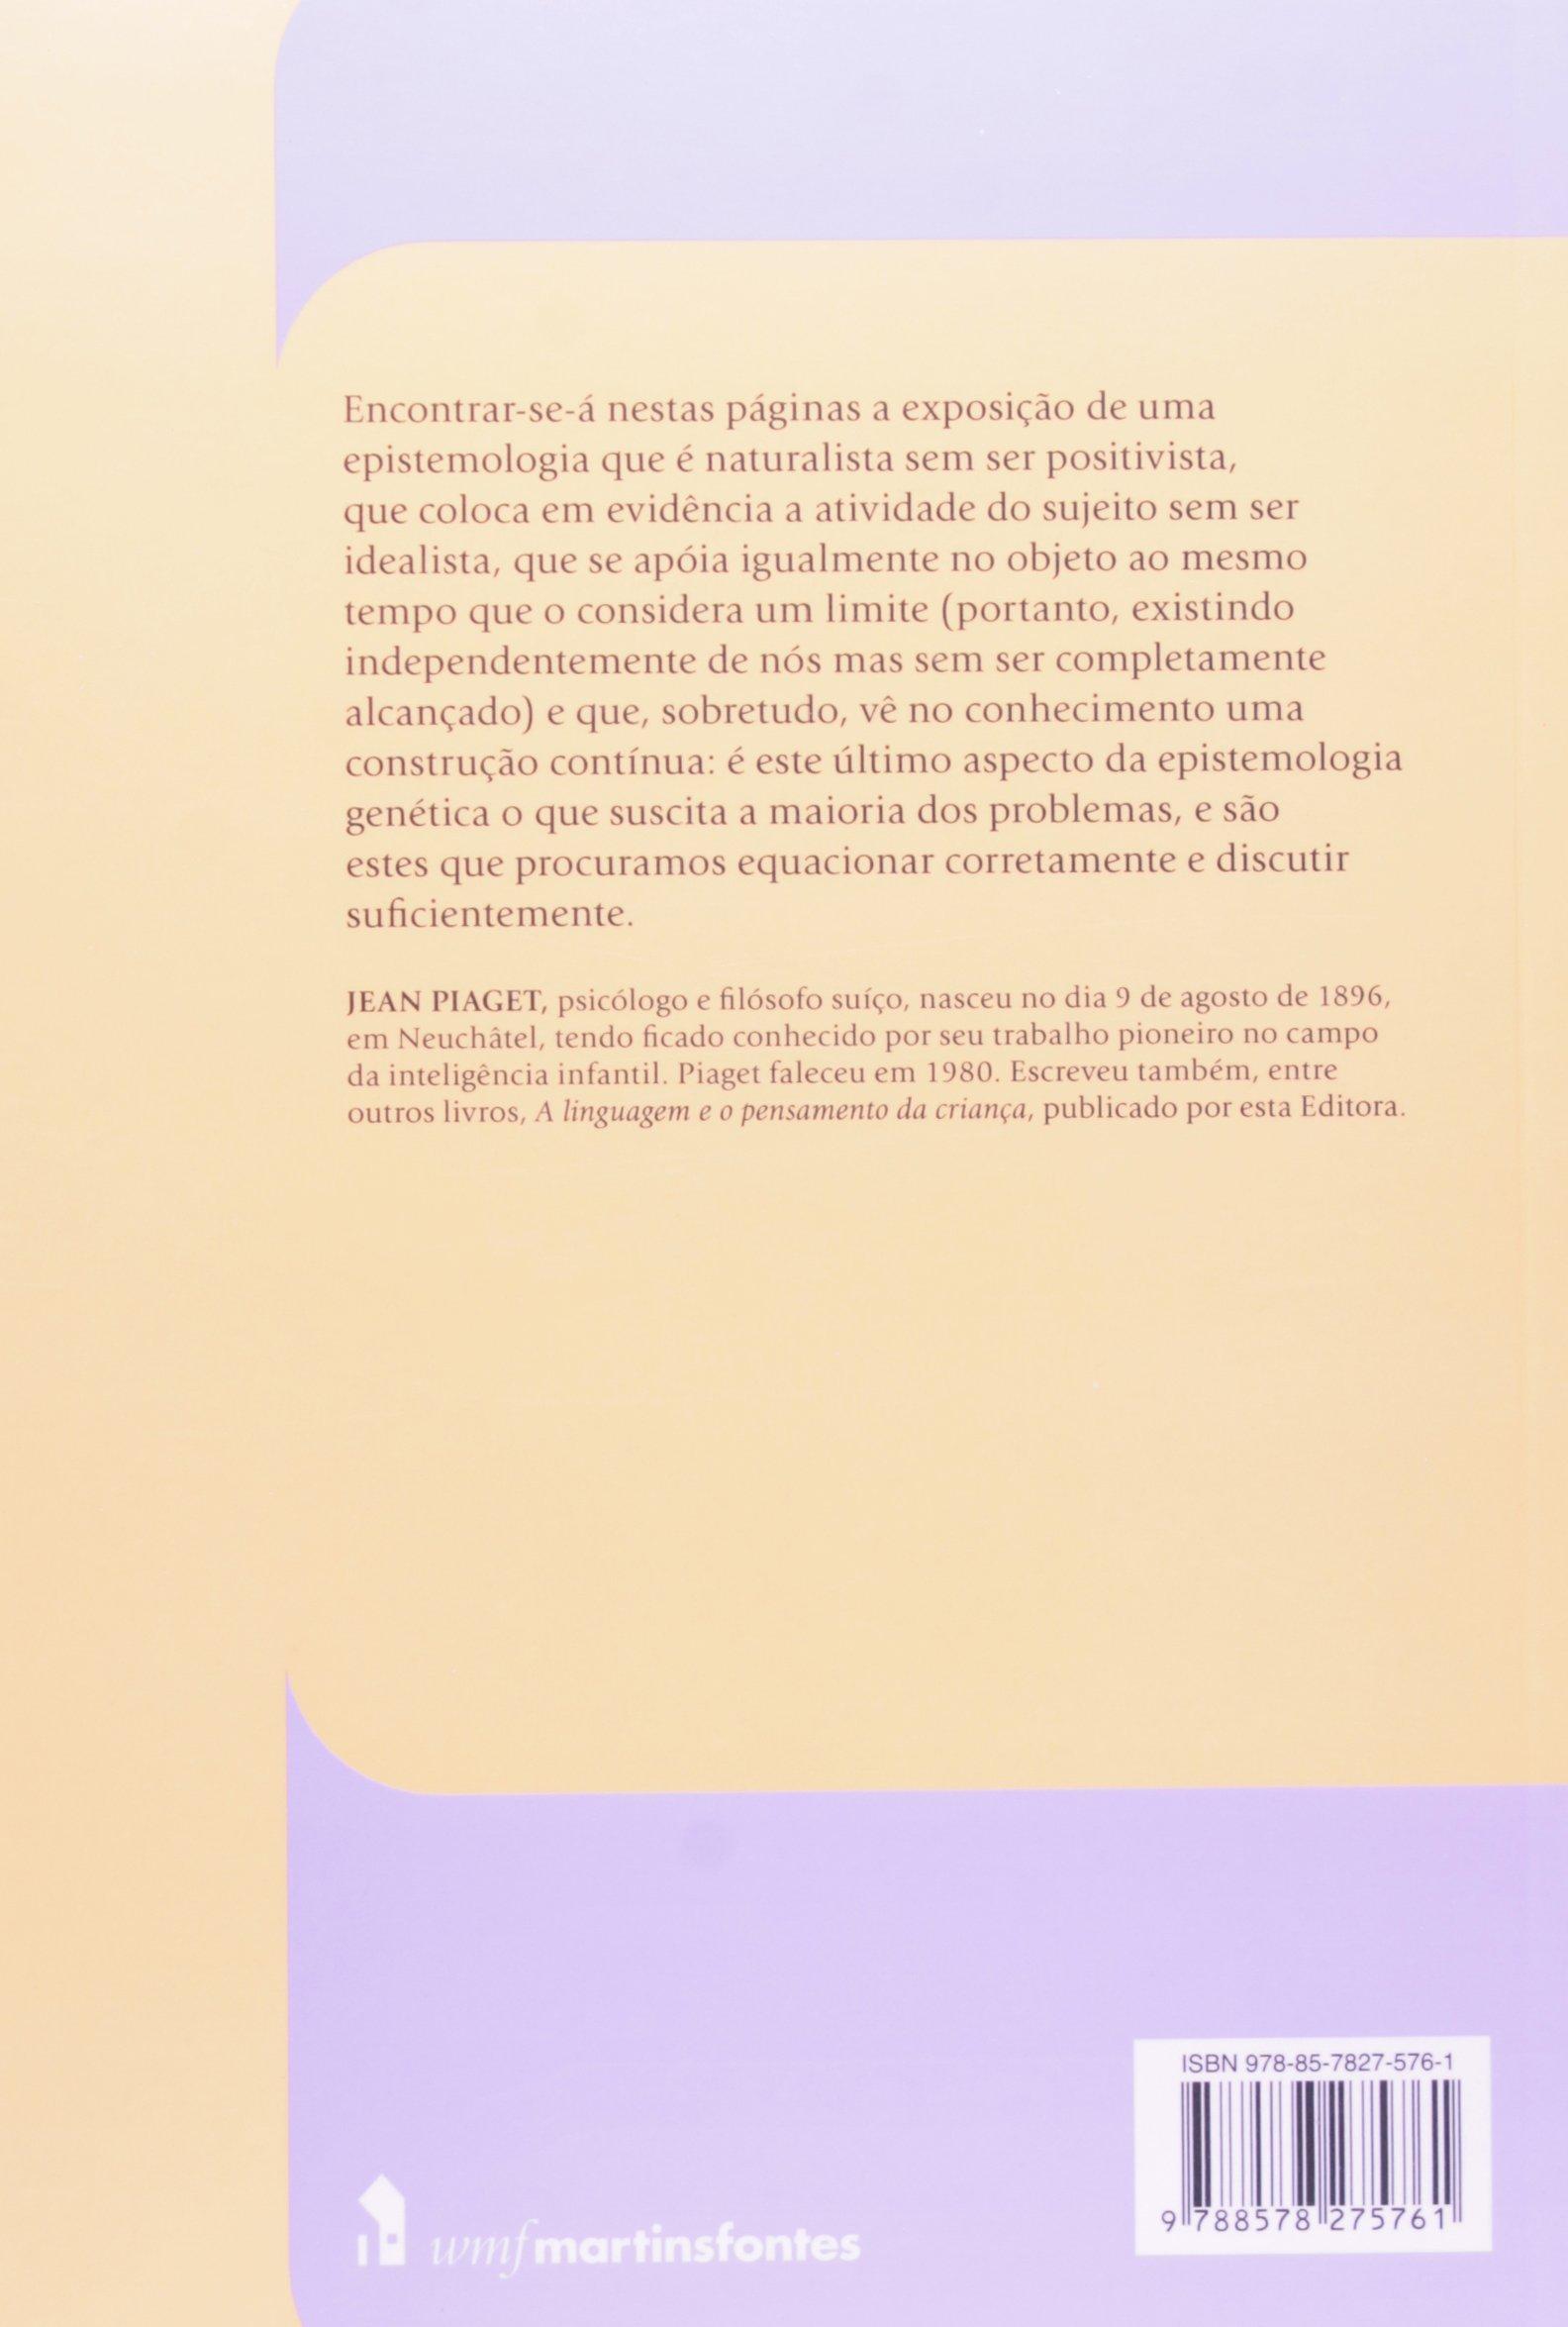 dd6fb64f349 Epistemologia genética - 9788578275761 - Livros na Amazon Brasil